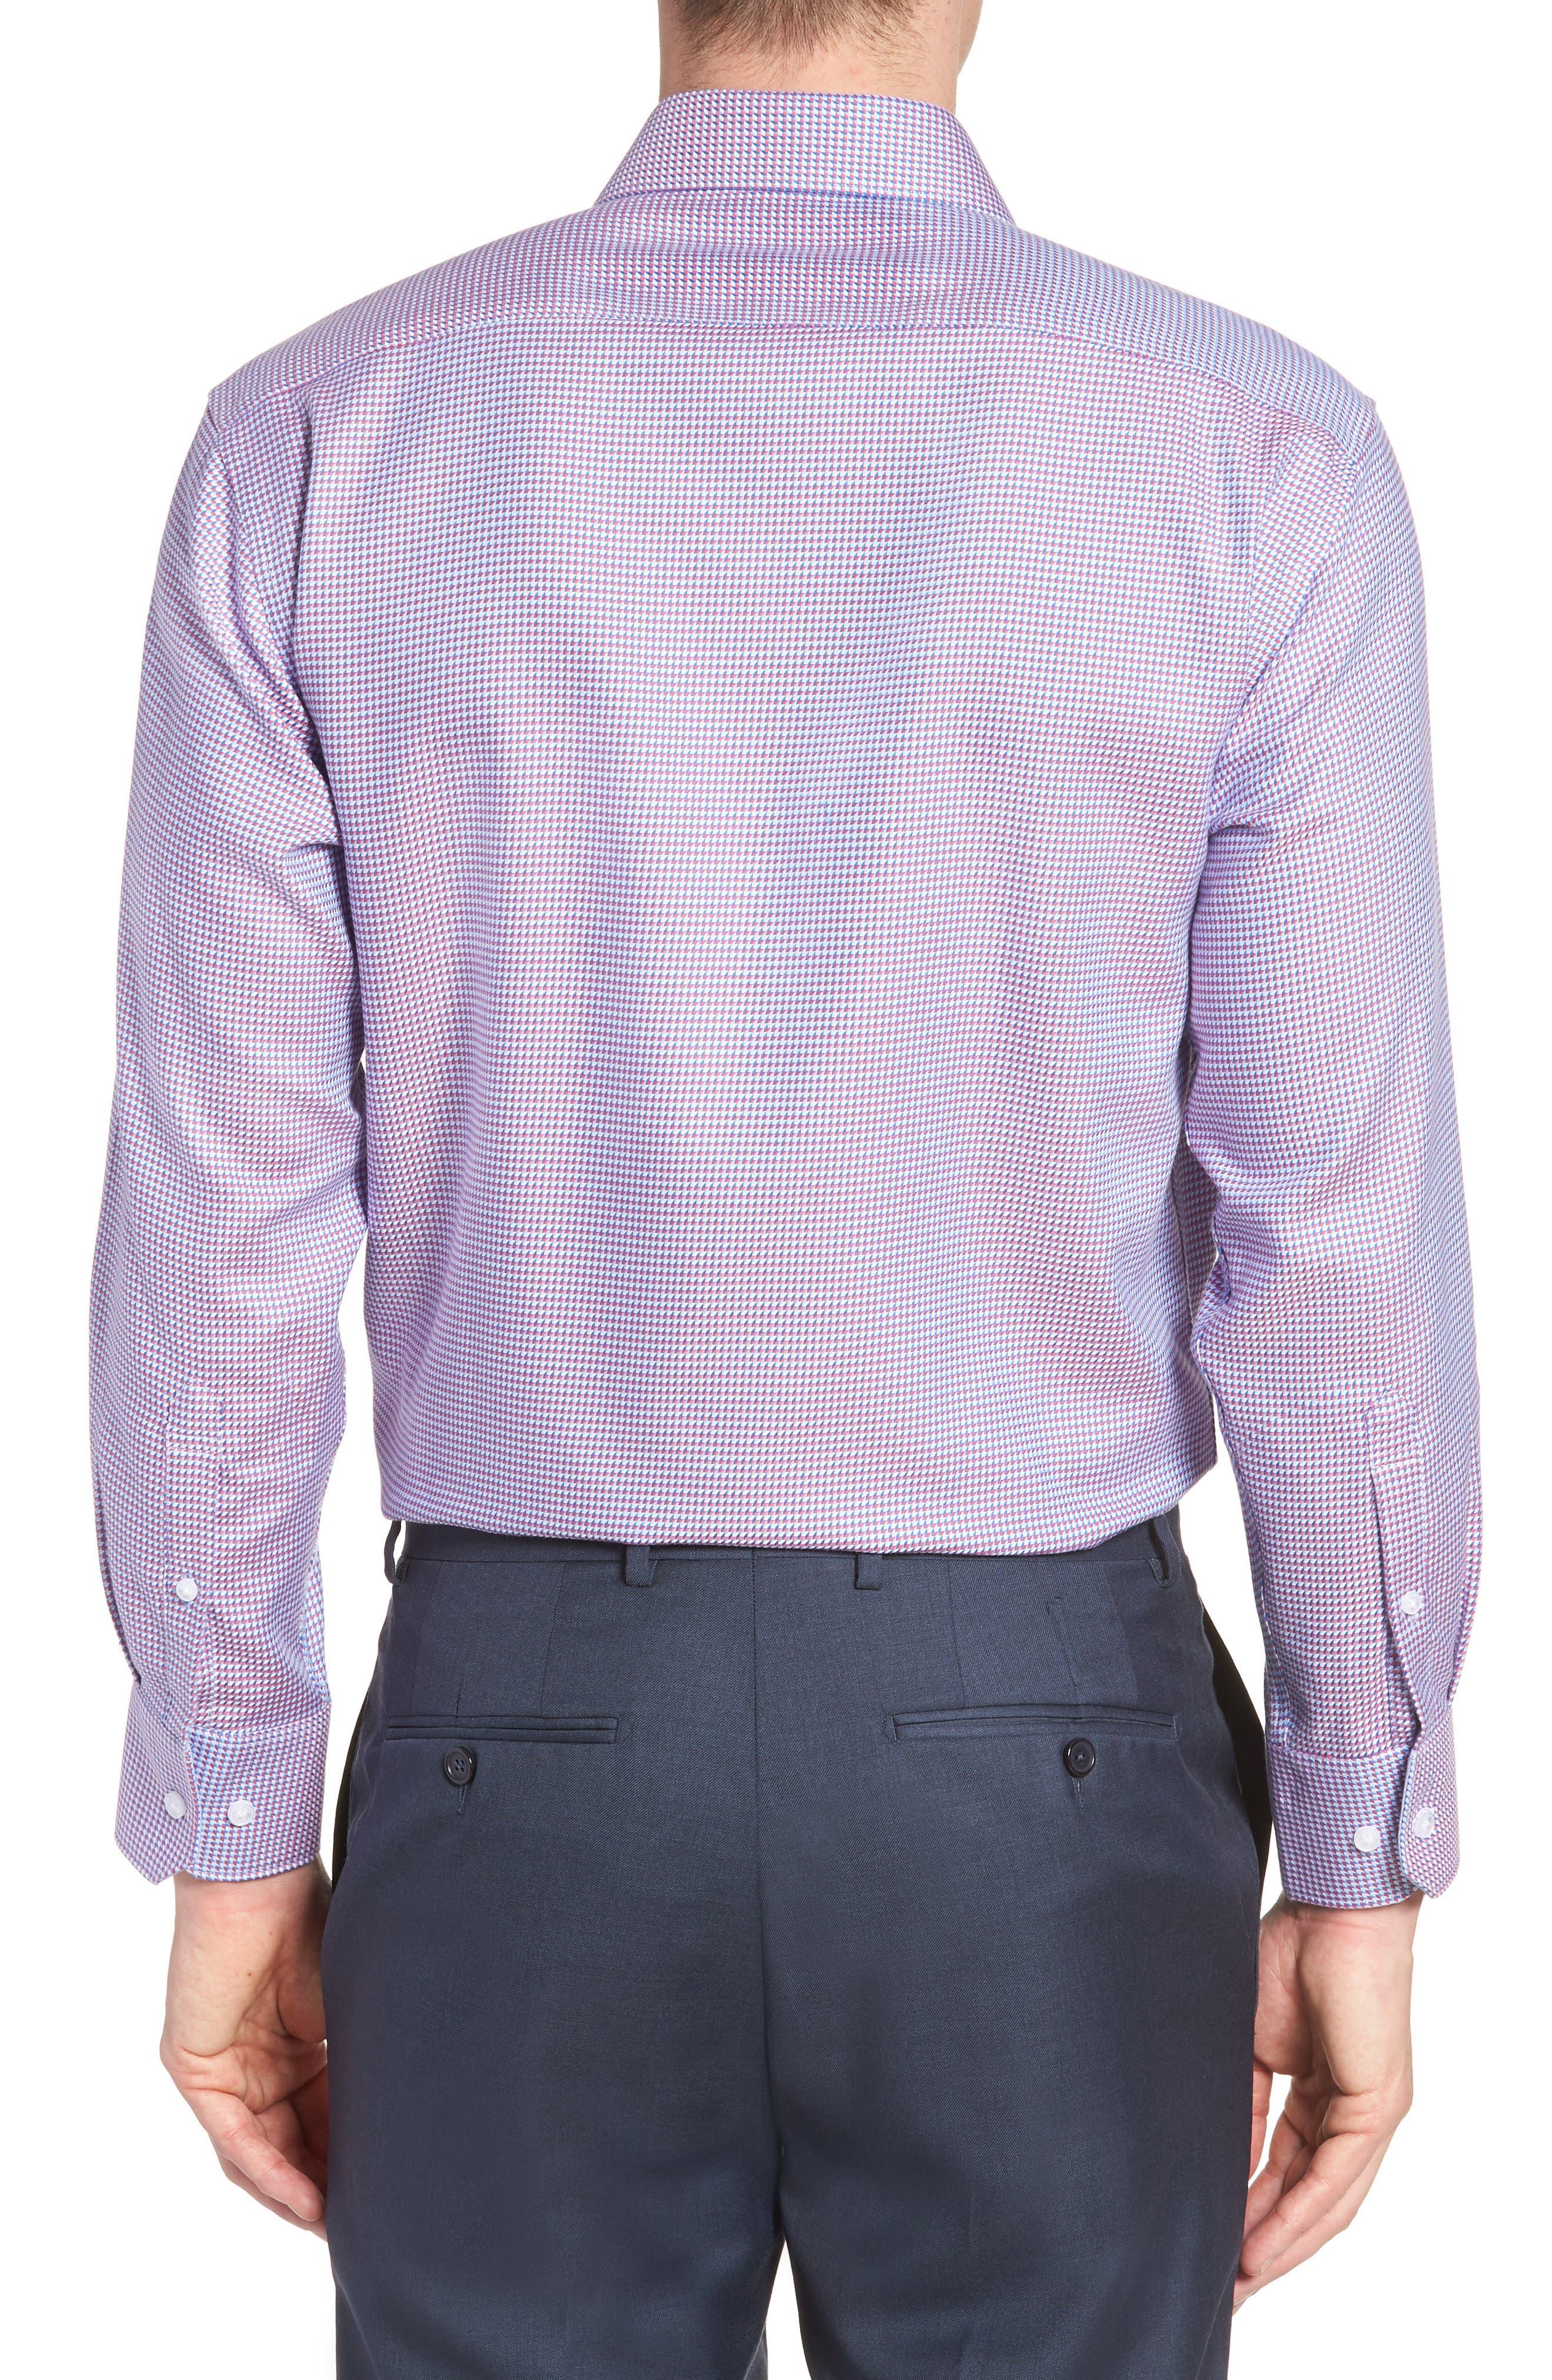 Axton Trim Fit Geometric Dress Shirt,                             Alternate thumbnail 3, color,                             Red/ Blue